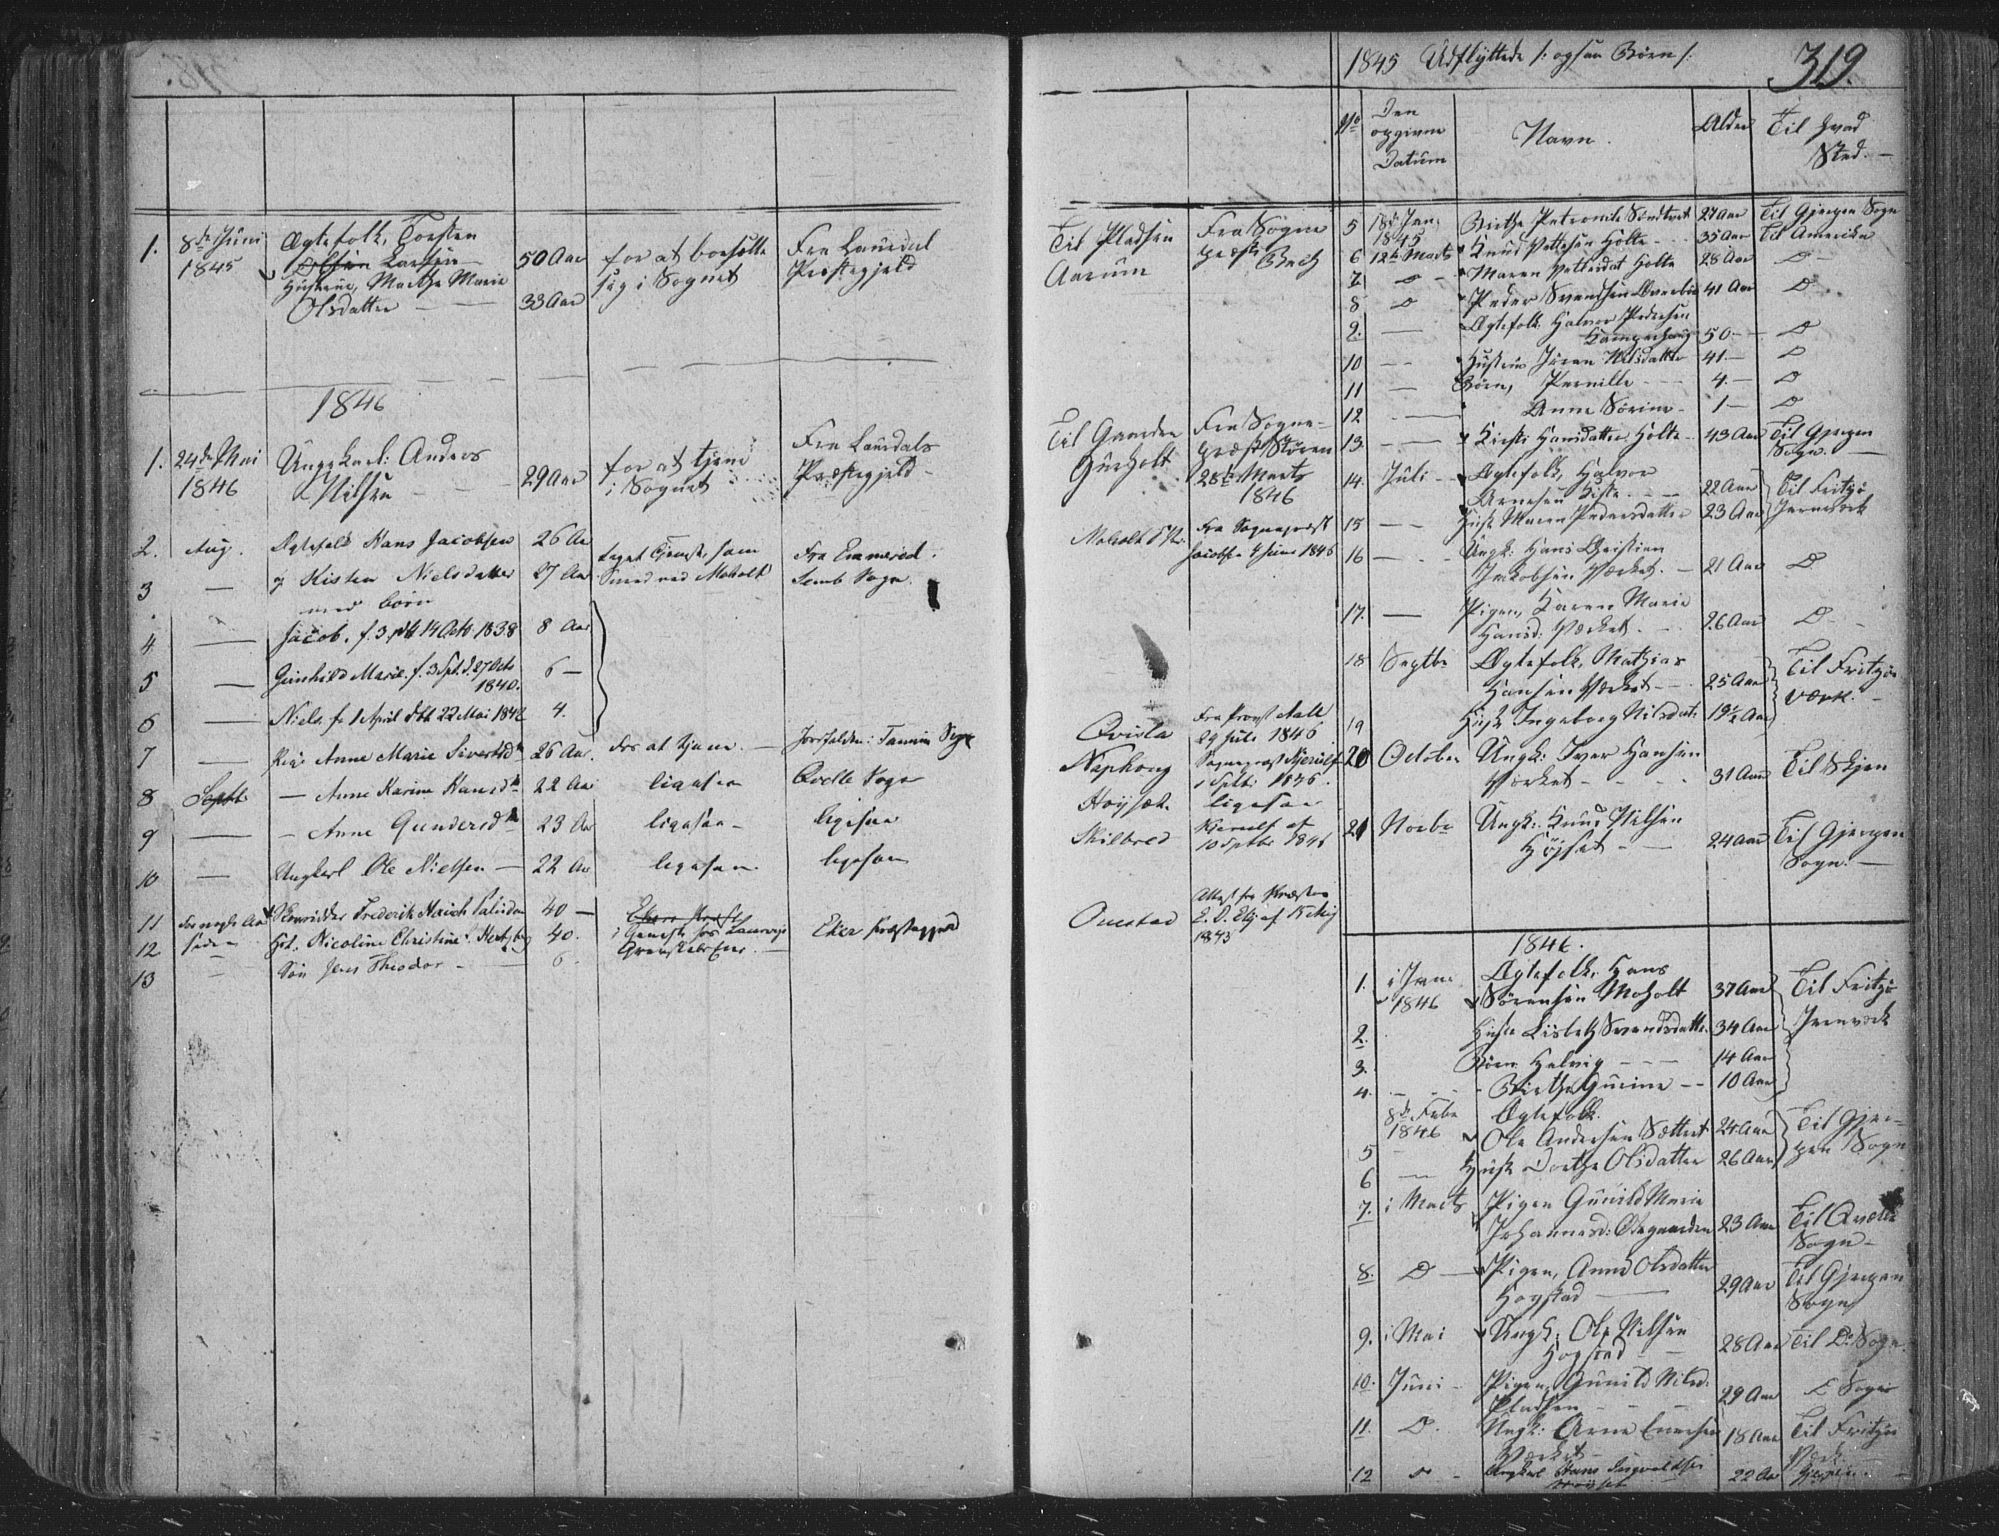 SAKO, Siljan kirkebøker, F/Fa/L0001: Parish register (official) no. 1, 1831-1870, p. 319